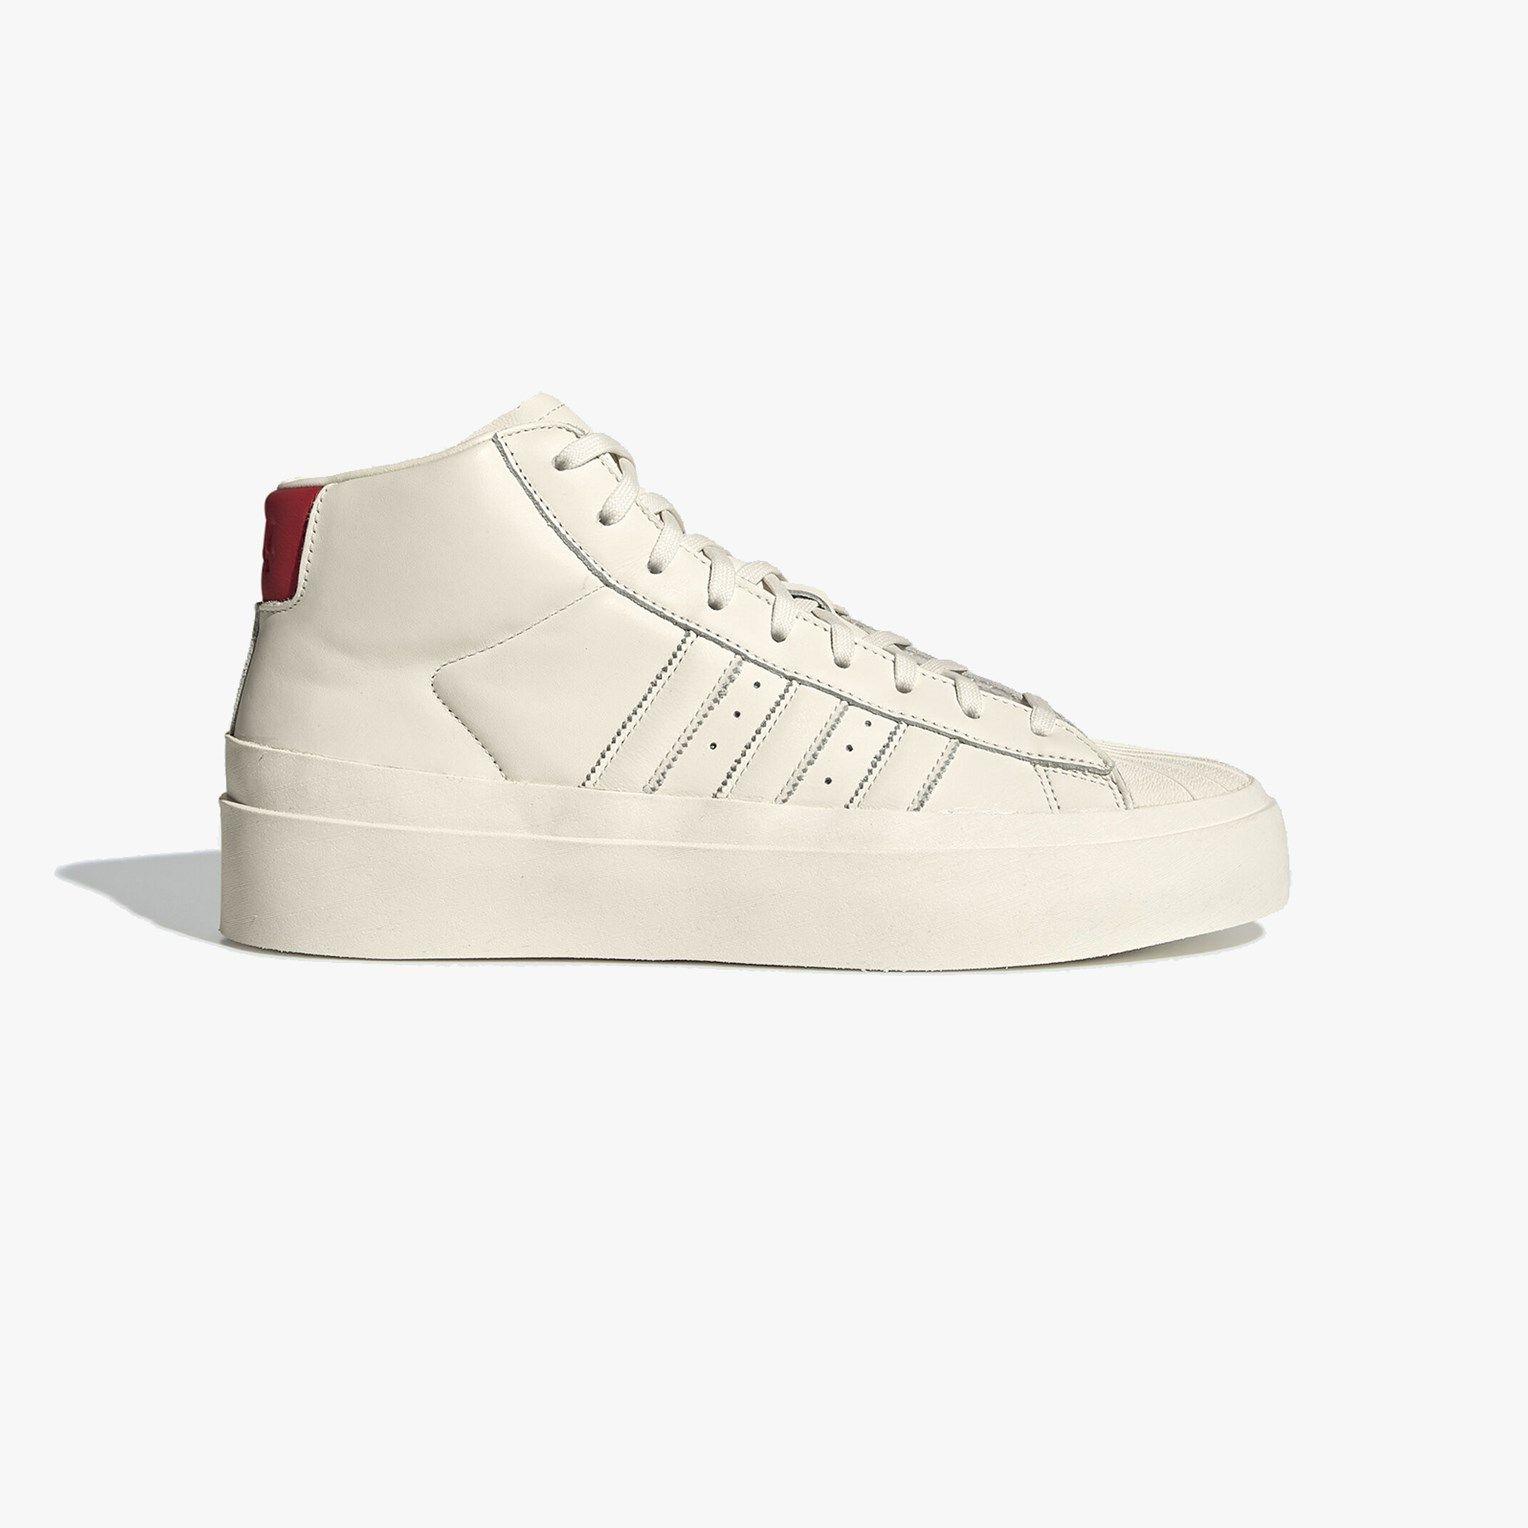 adidas 424 Pro Model - Eg3096 - Sneakersnstuff | sneakers ...